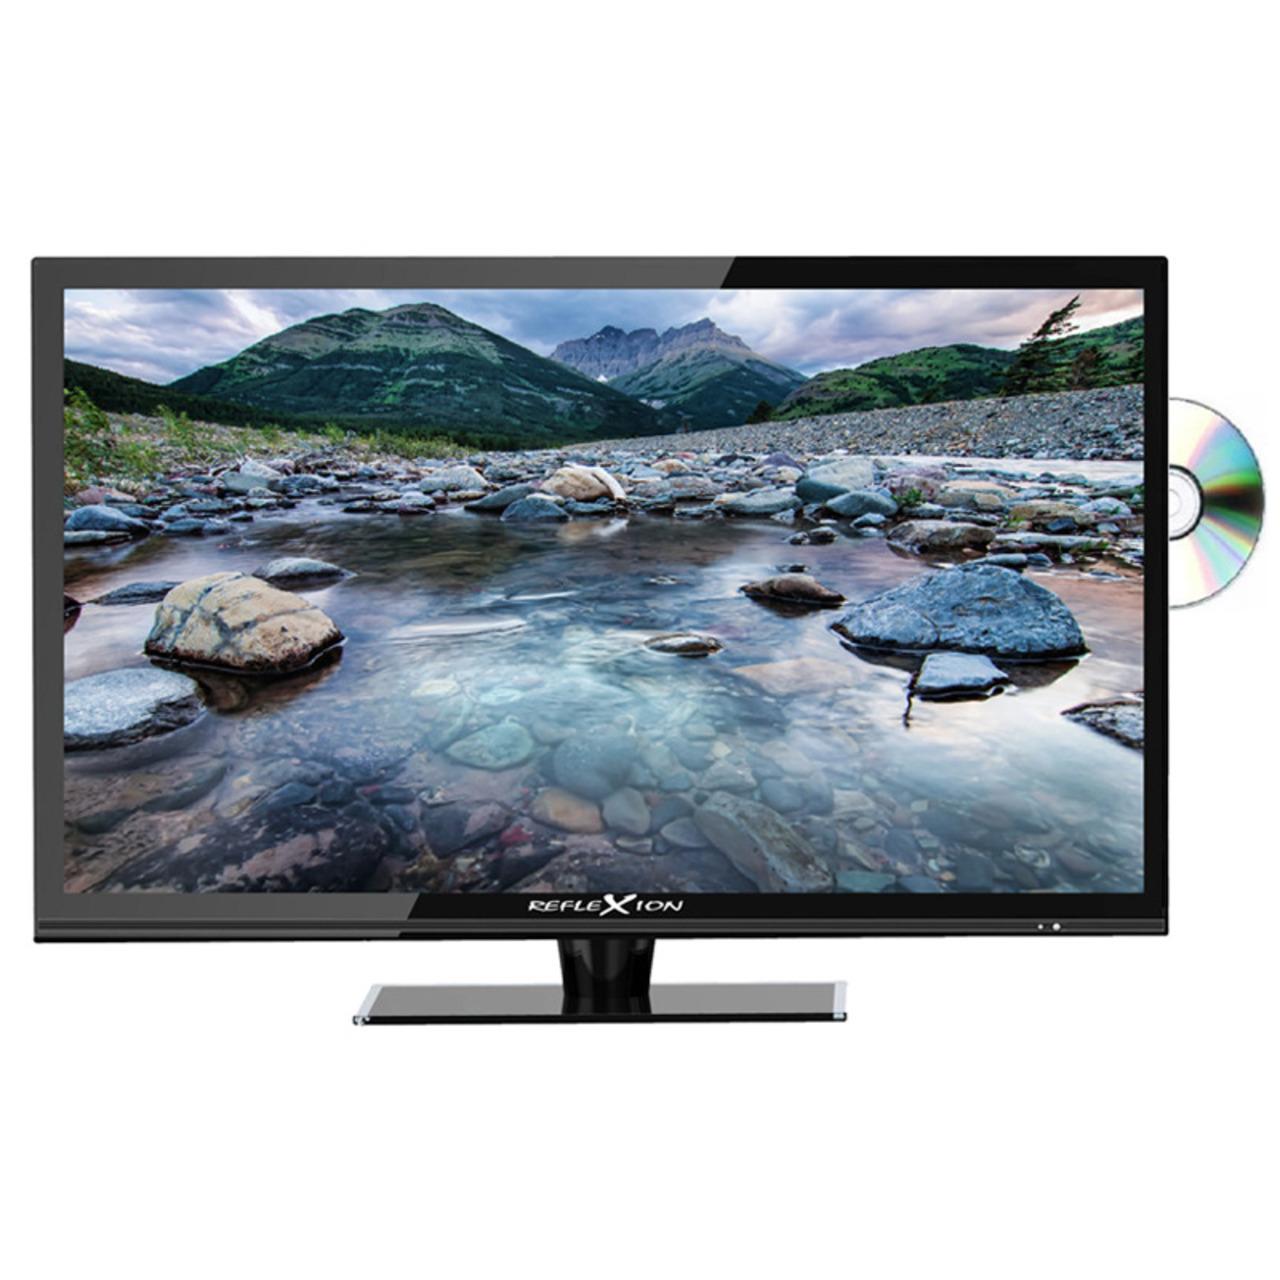 Reflexion 5-in-1-LED-TV LDDW160- 40 cm (15-6)- DVD-Player- DVB-S-S2-C-T-T2- H-265-HEVC- Full HD